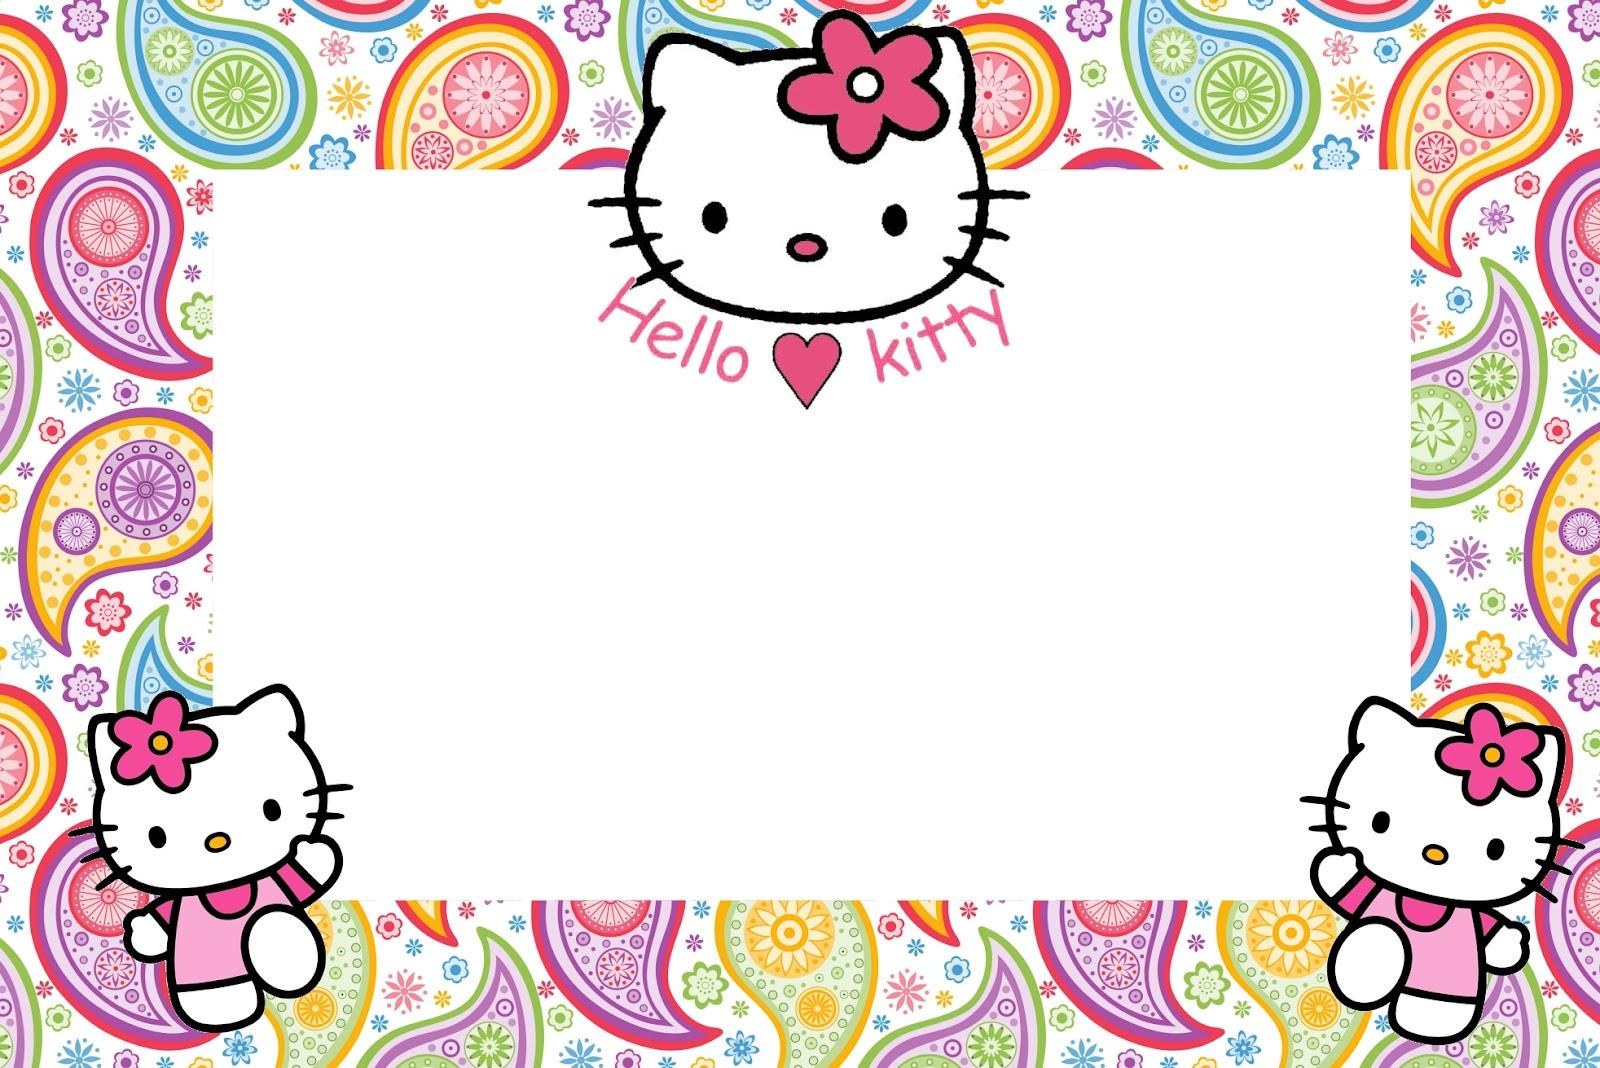 hello kitty party free printable invitations  oh my